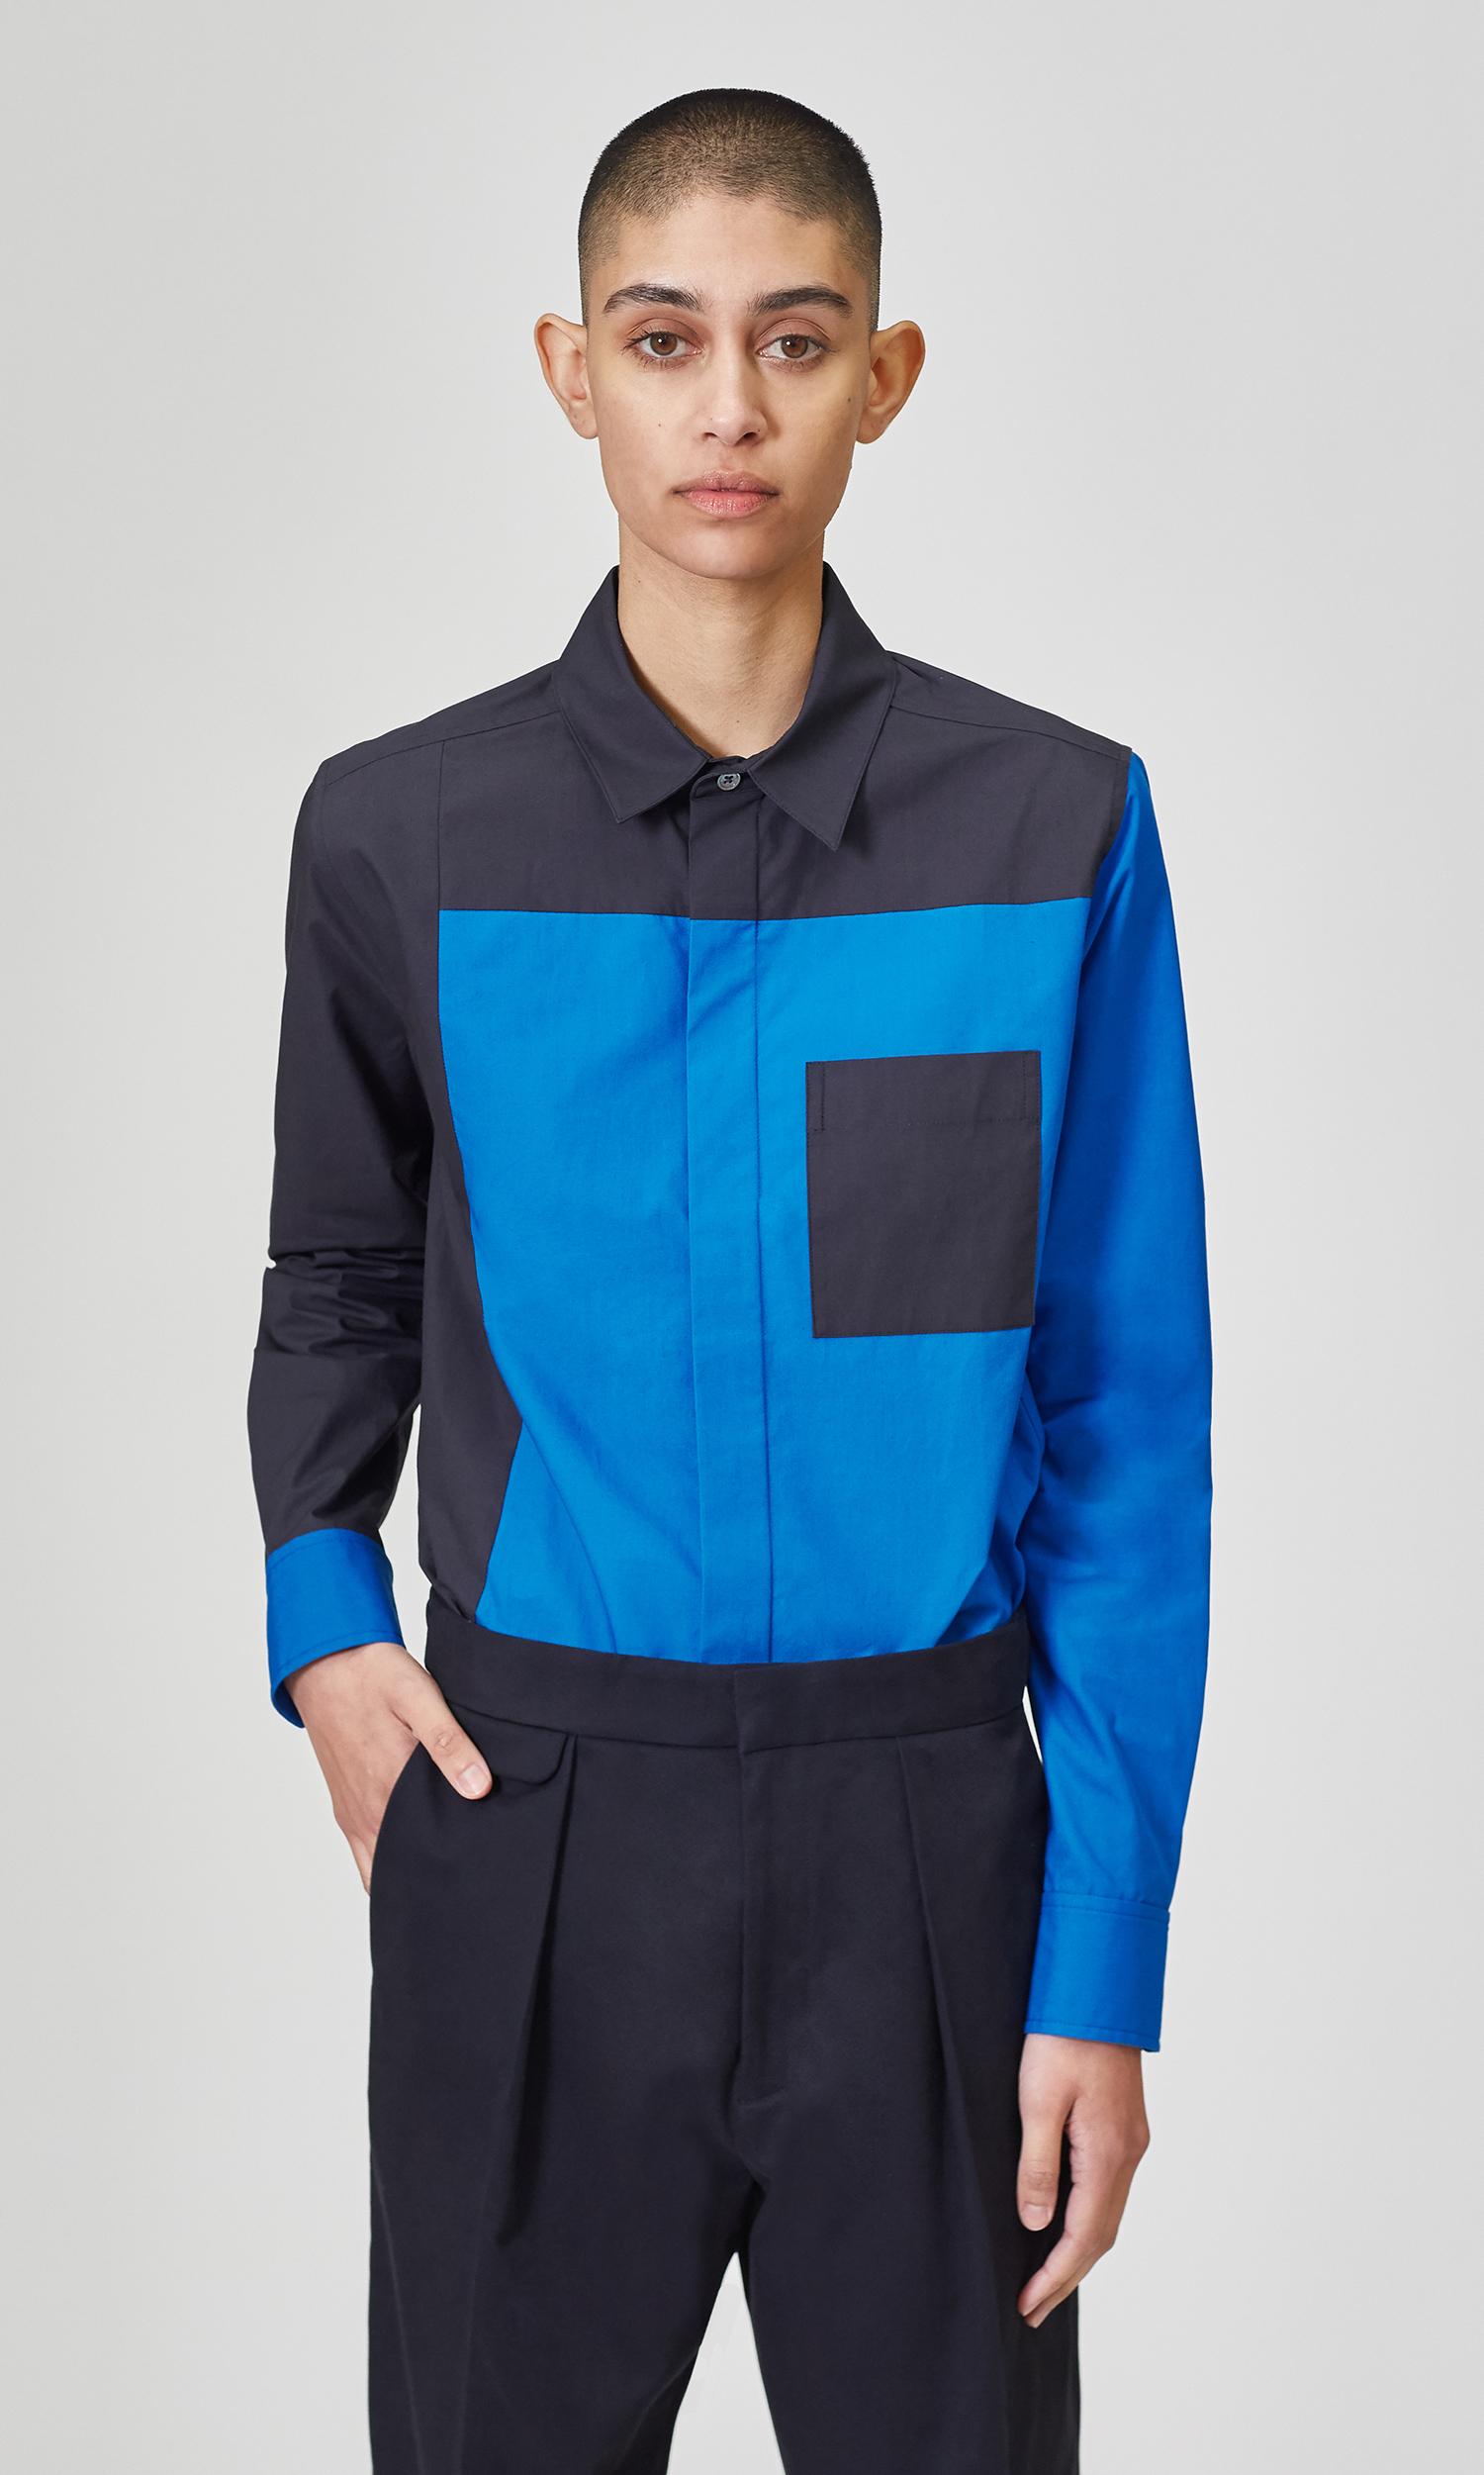 Slim Fit Color Block Cotton Shirt by Equipment